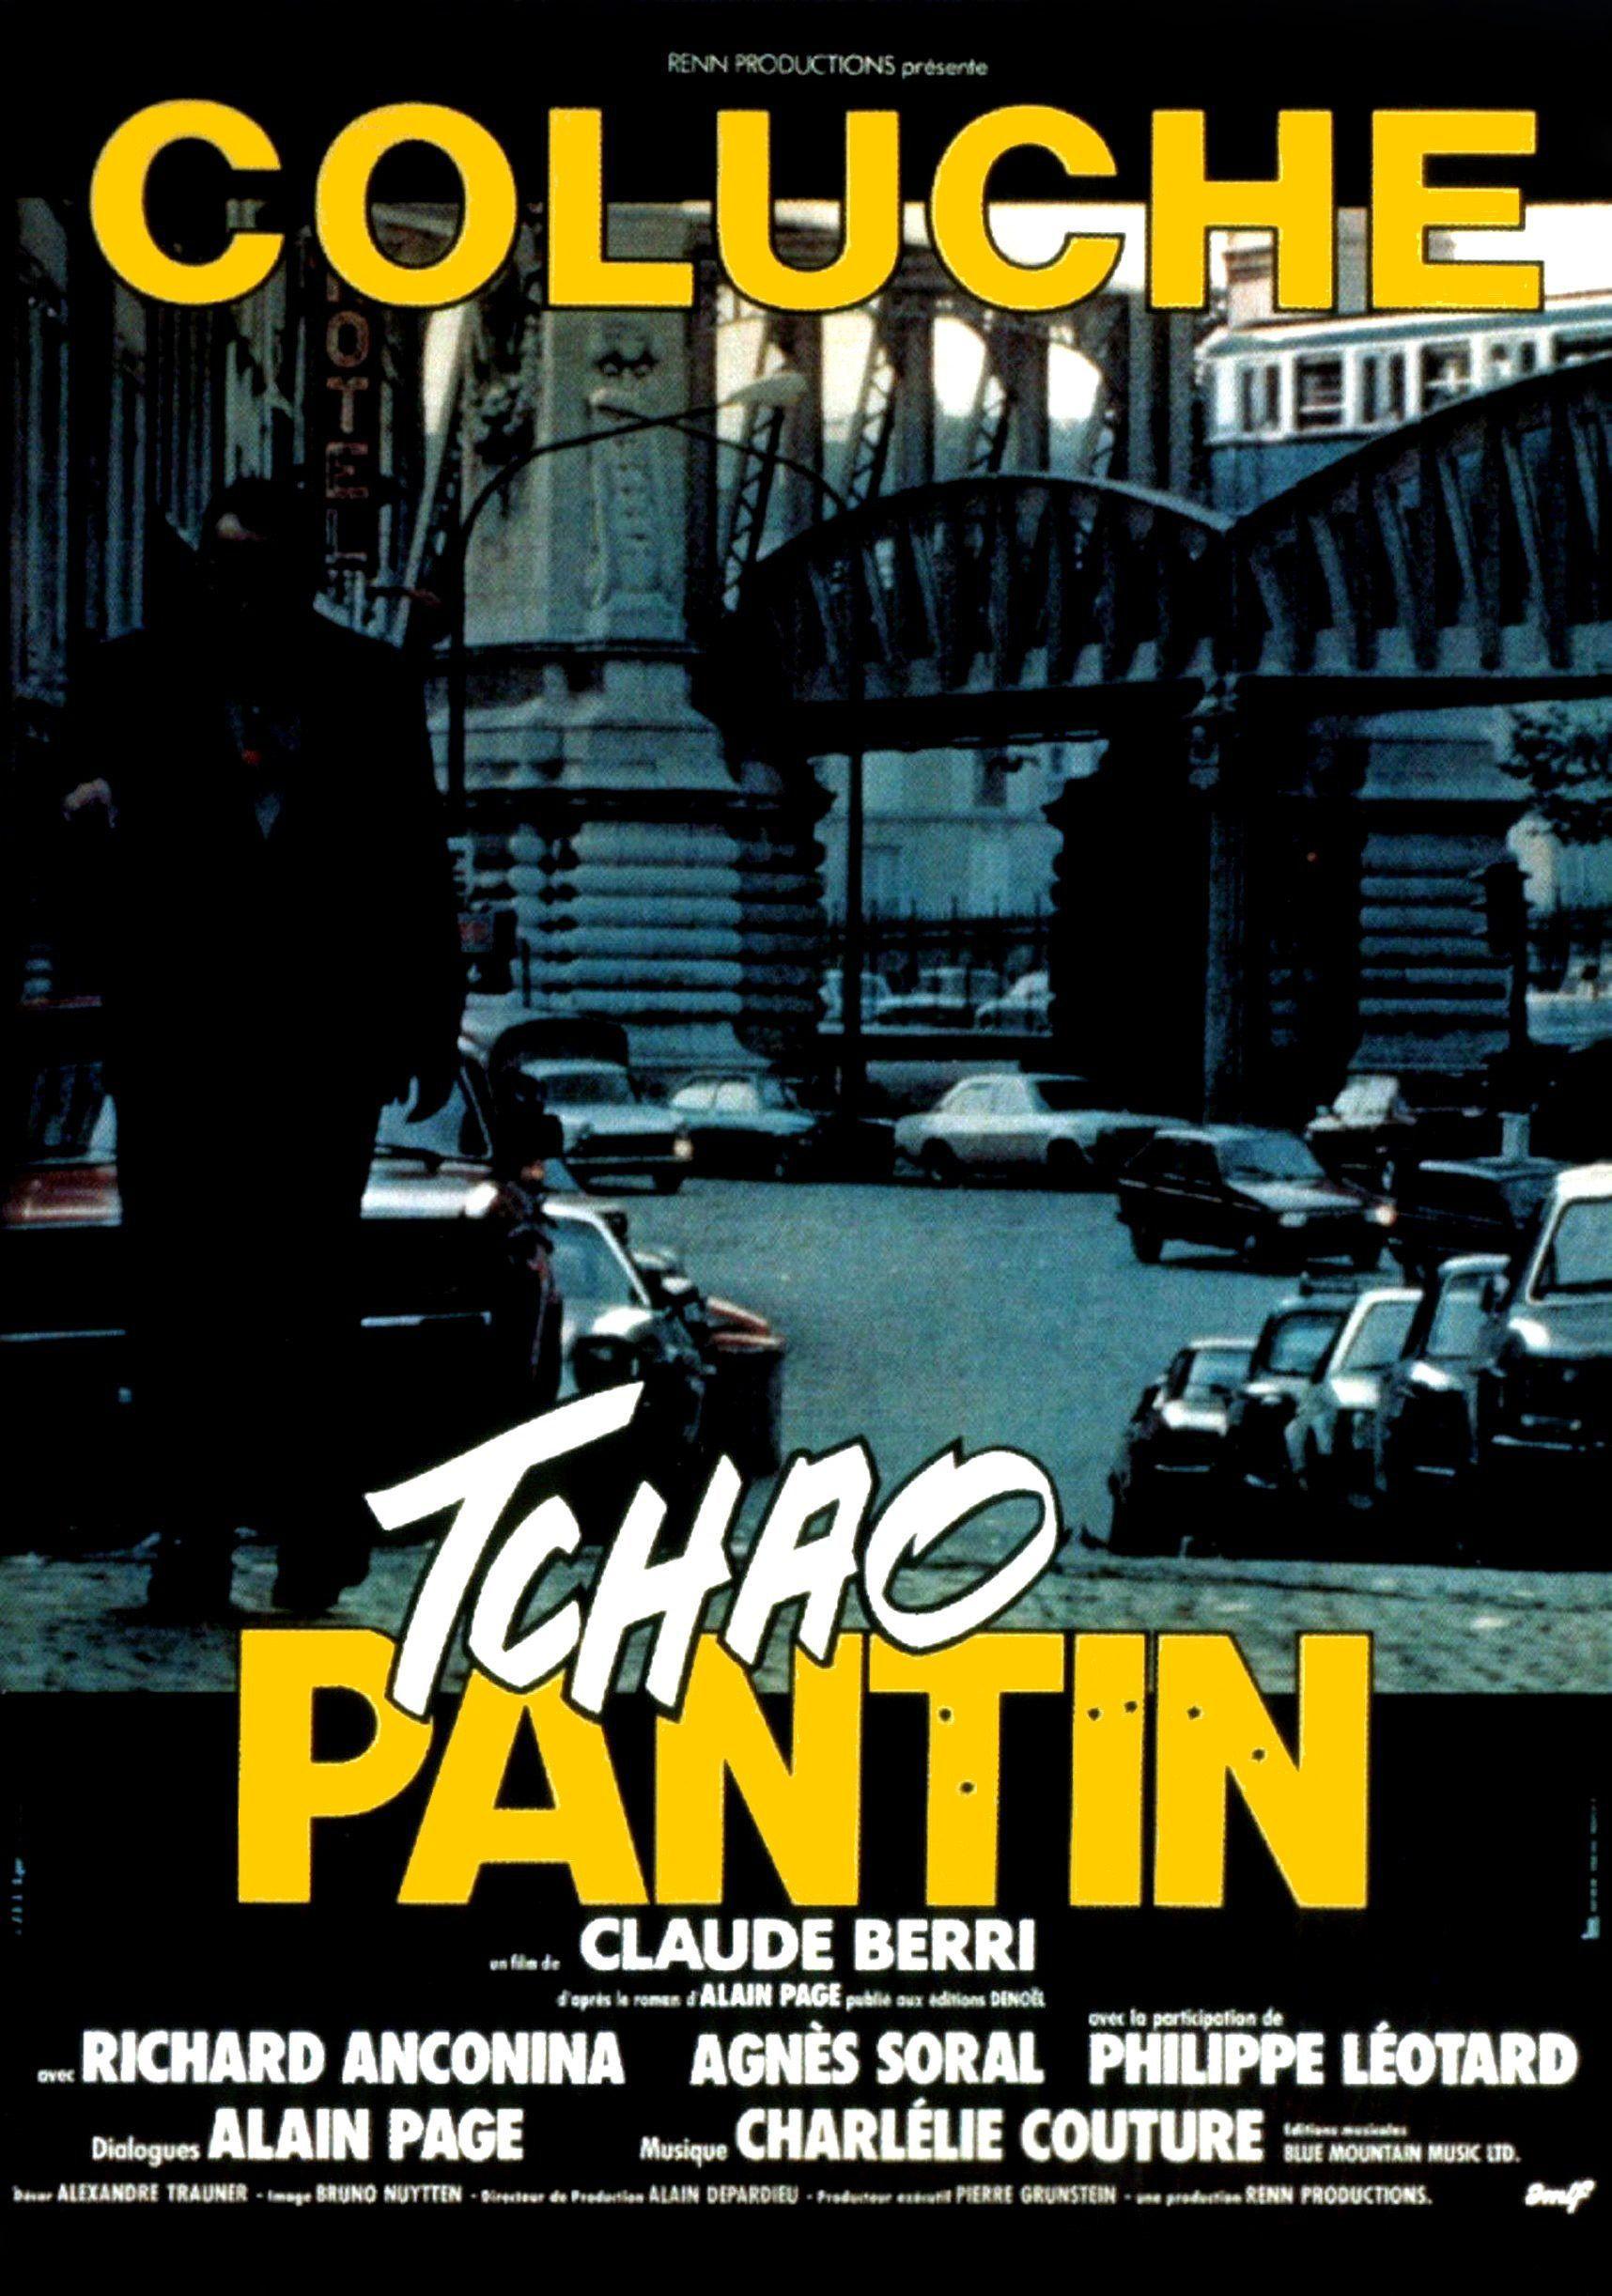 Tchao Pantin de Claude Berri